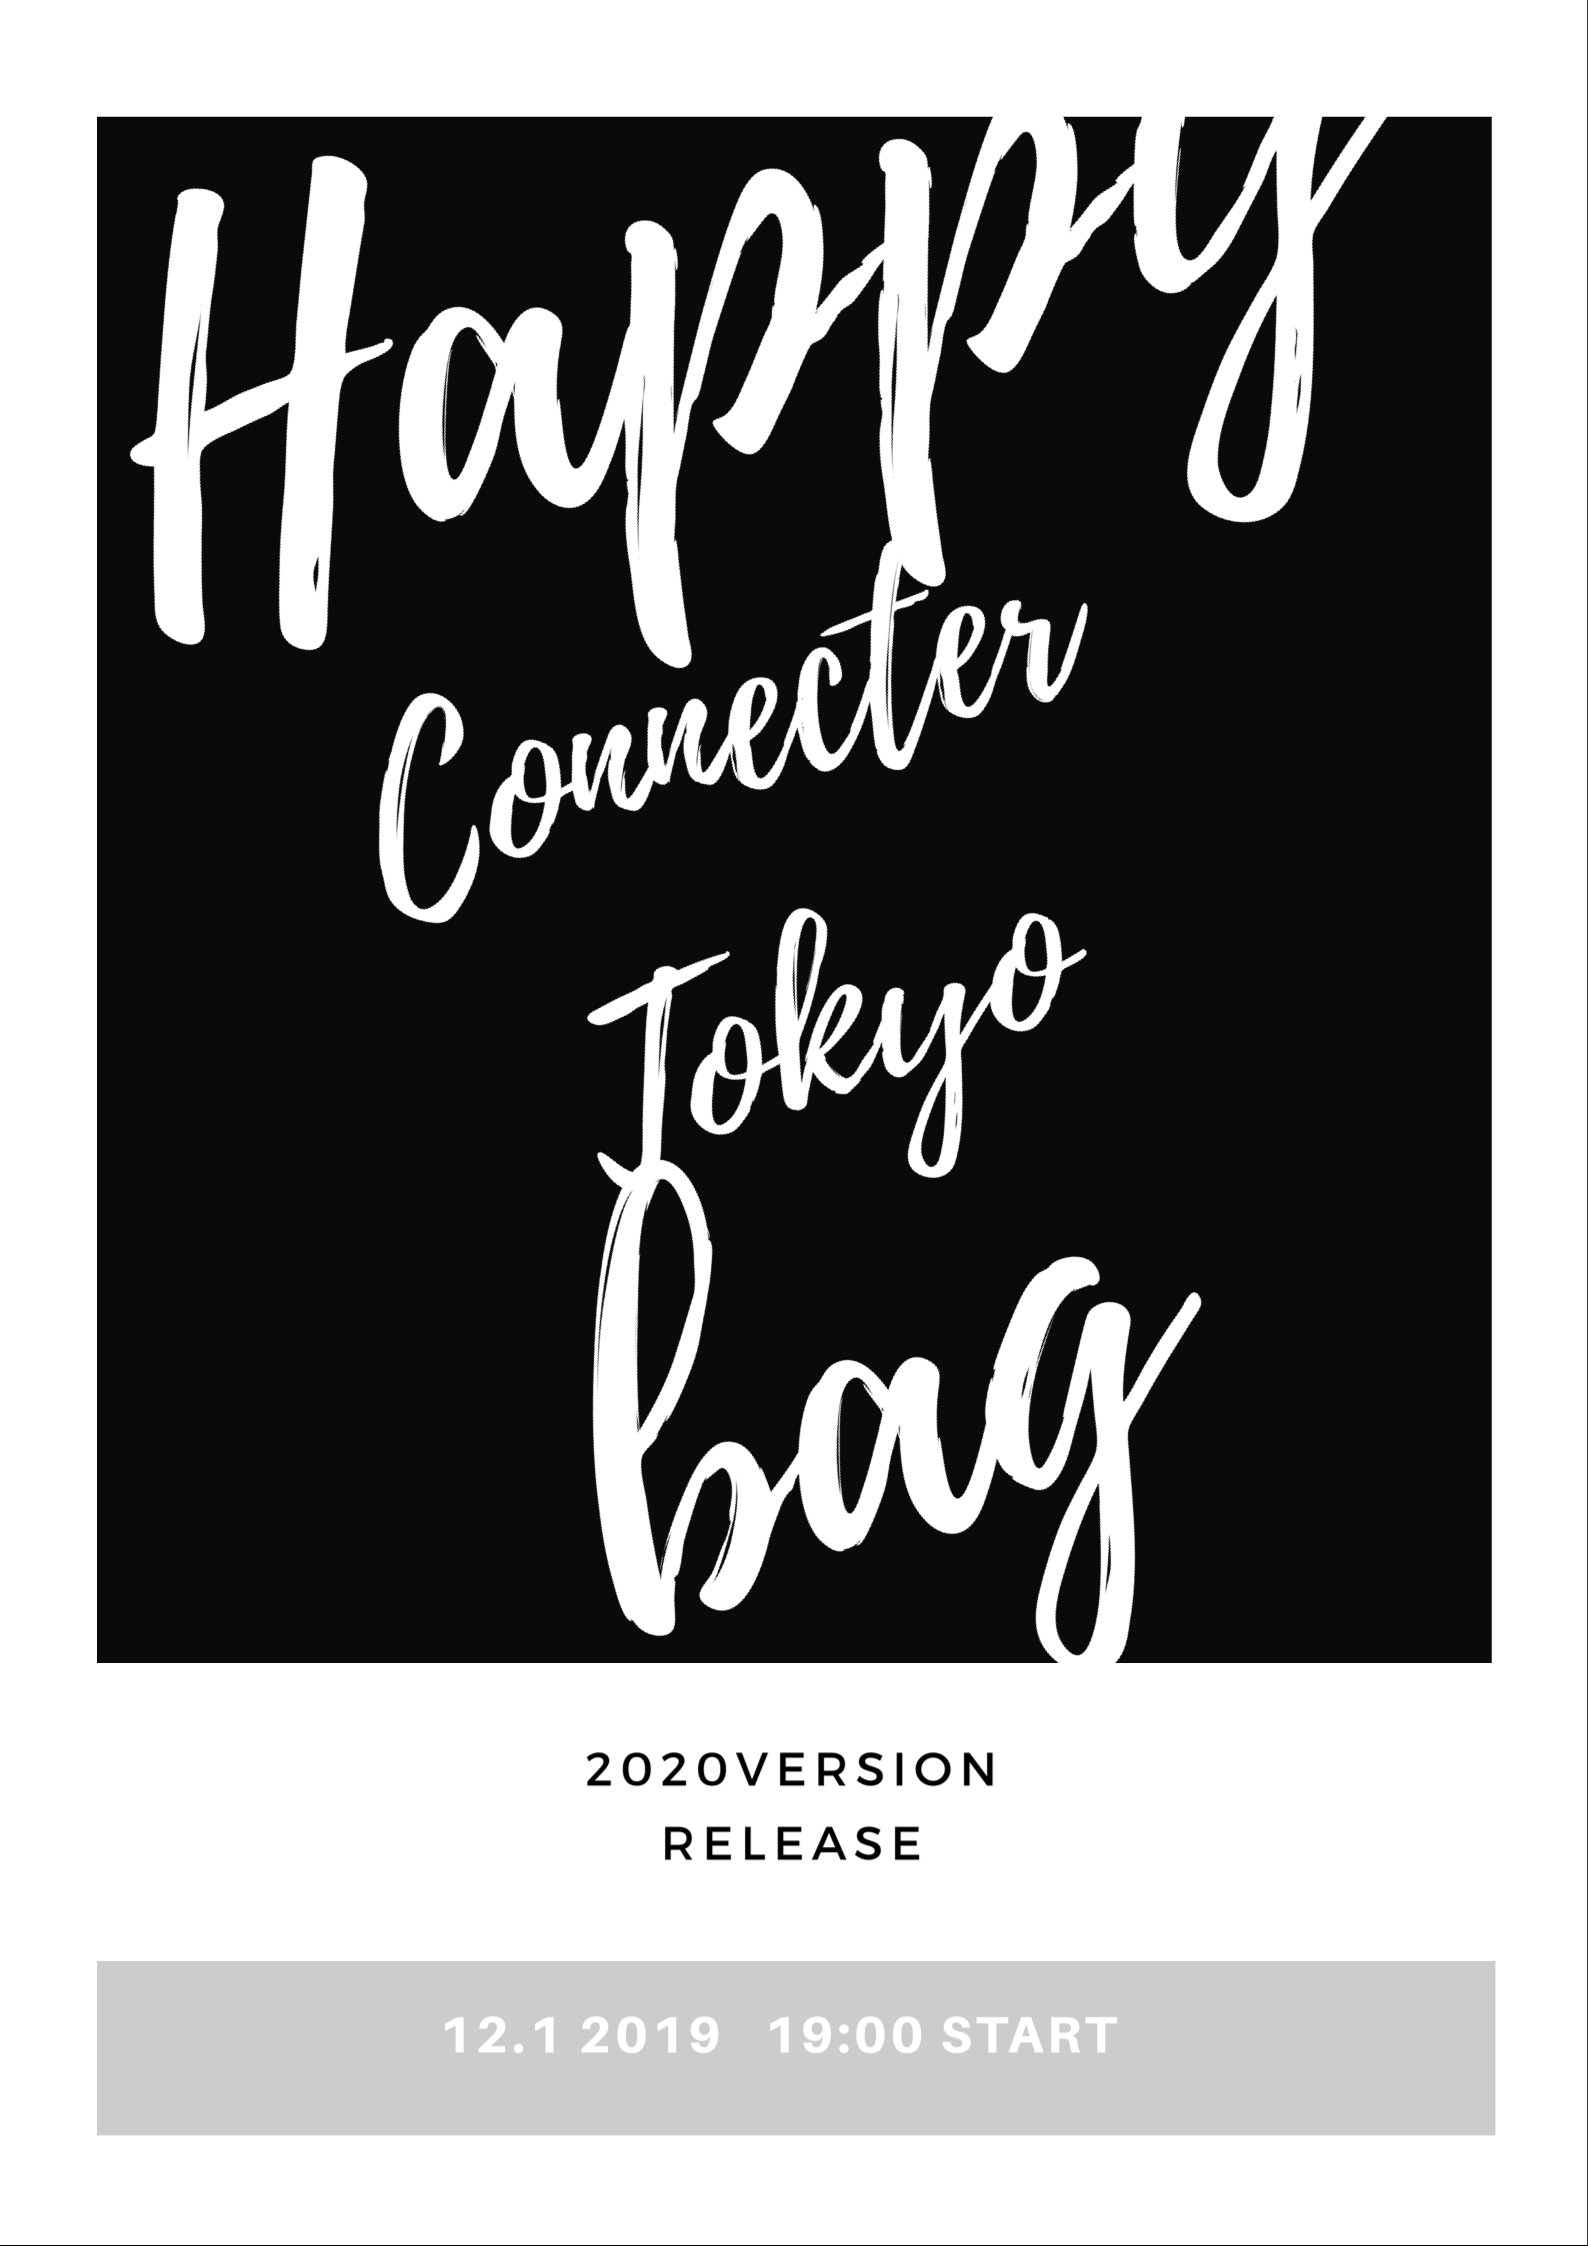 【info】 Connecter Tokyo 福袋 本日19時より販売決定